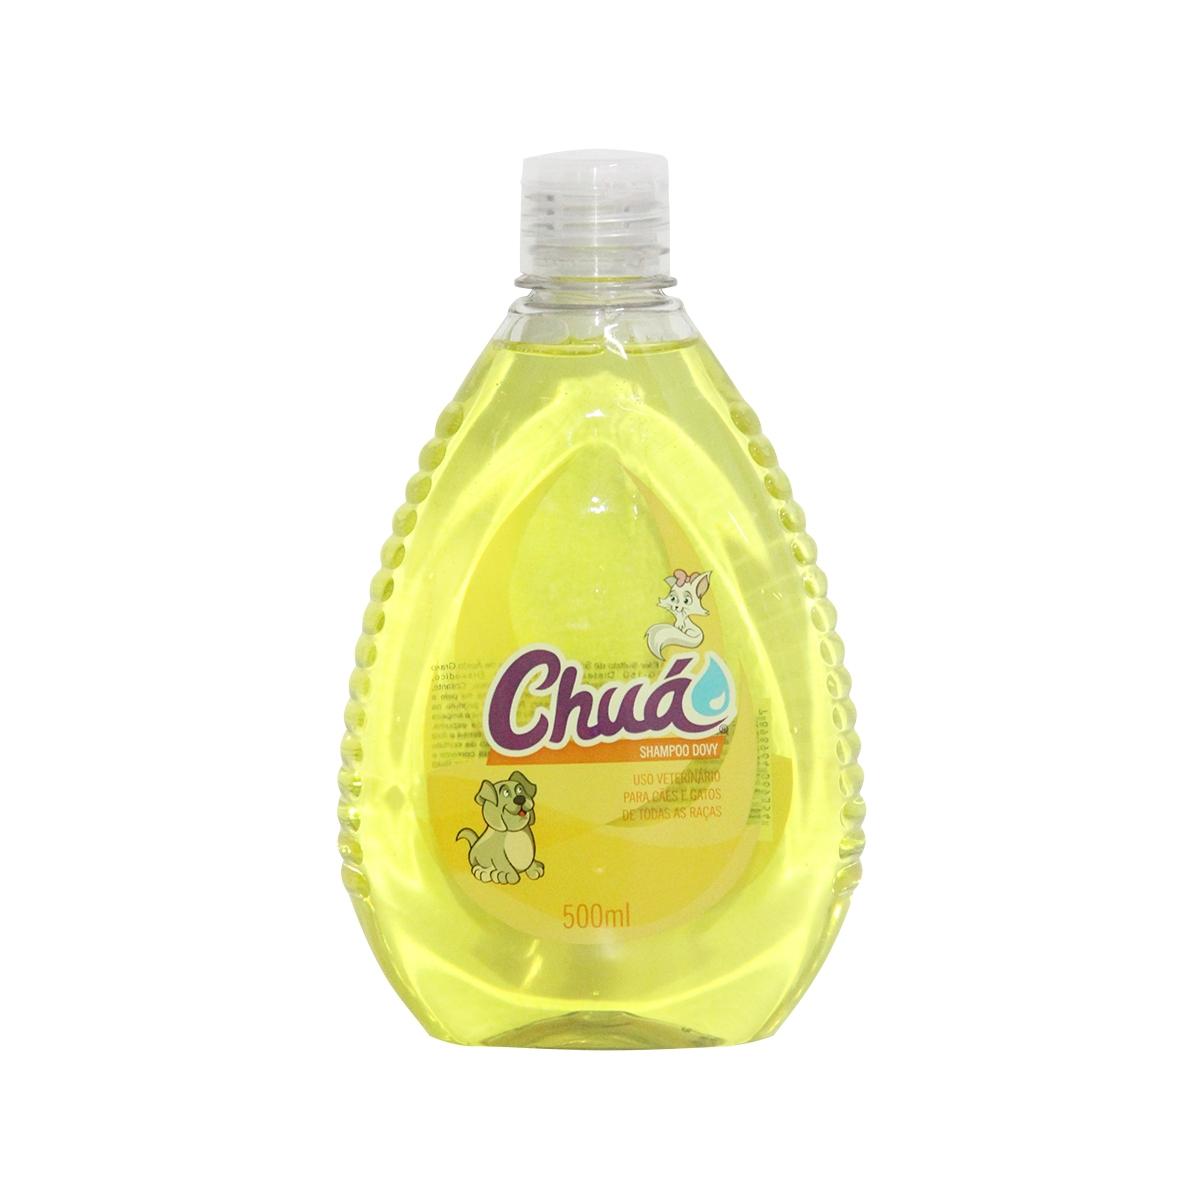 Shampoo Dovy Chuá -500ml